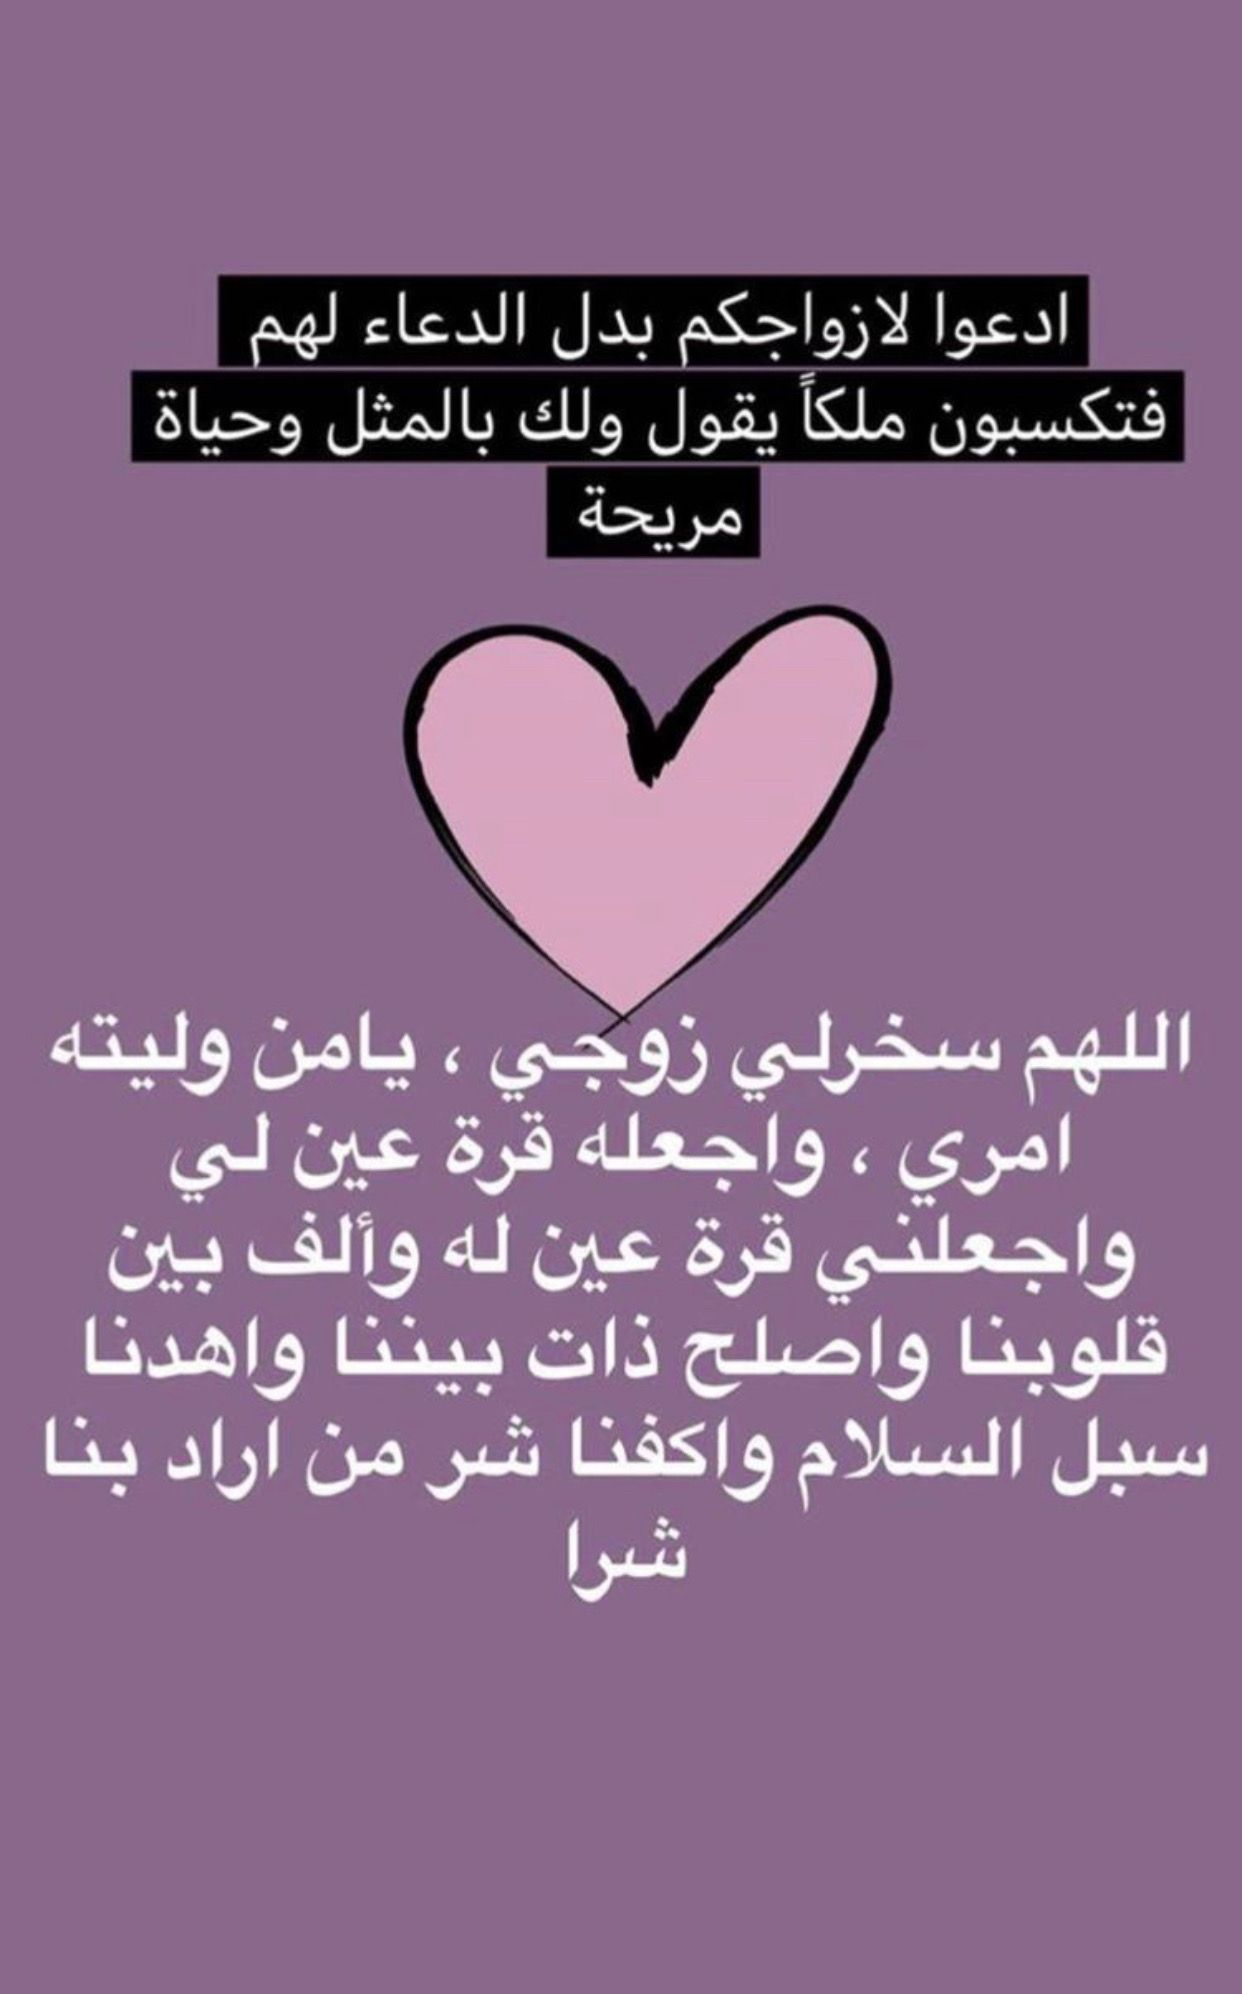 اللهم آميييييين Islam Facts Quran Quotes Love Quran Quotes